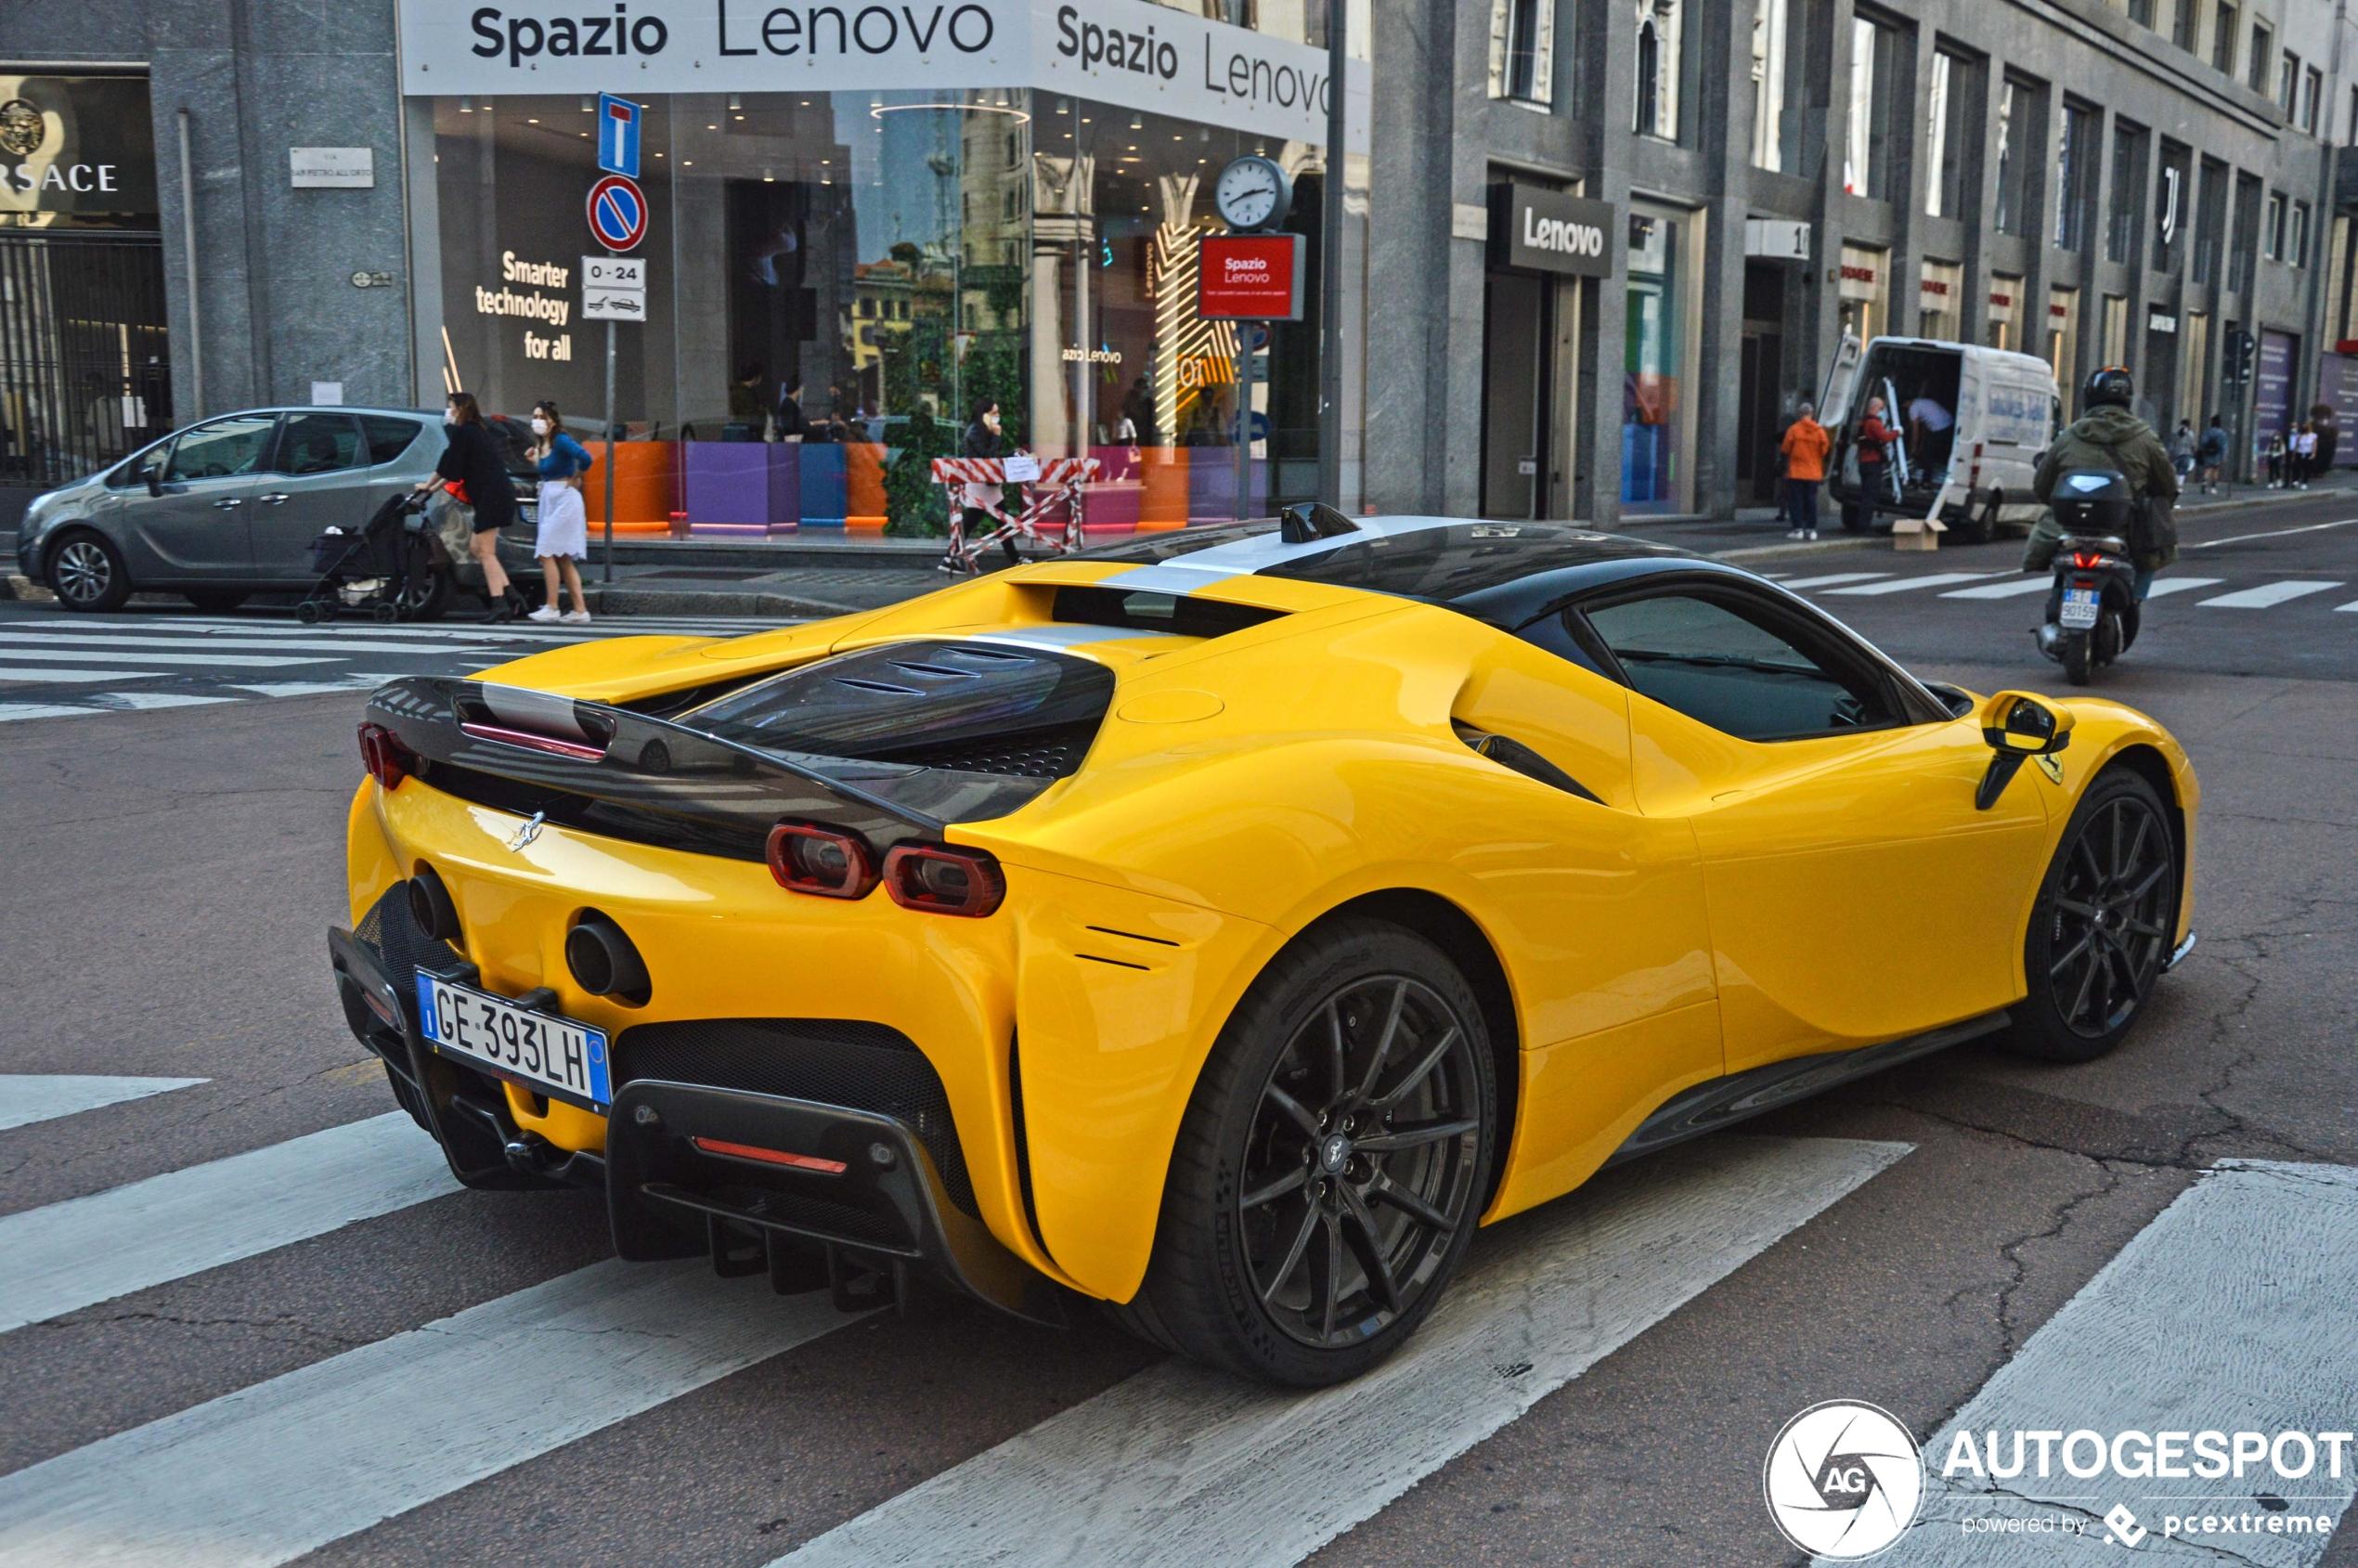 Ferrari SF90 Stradale stays impressive